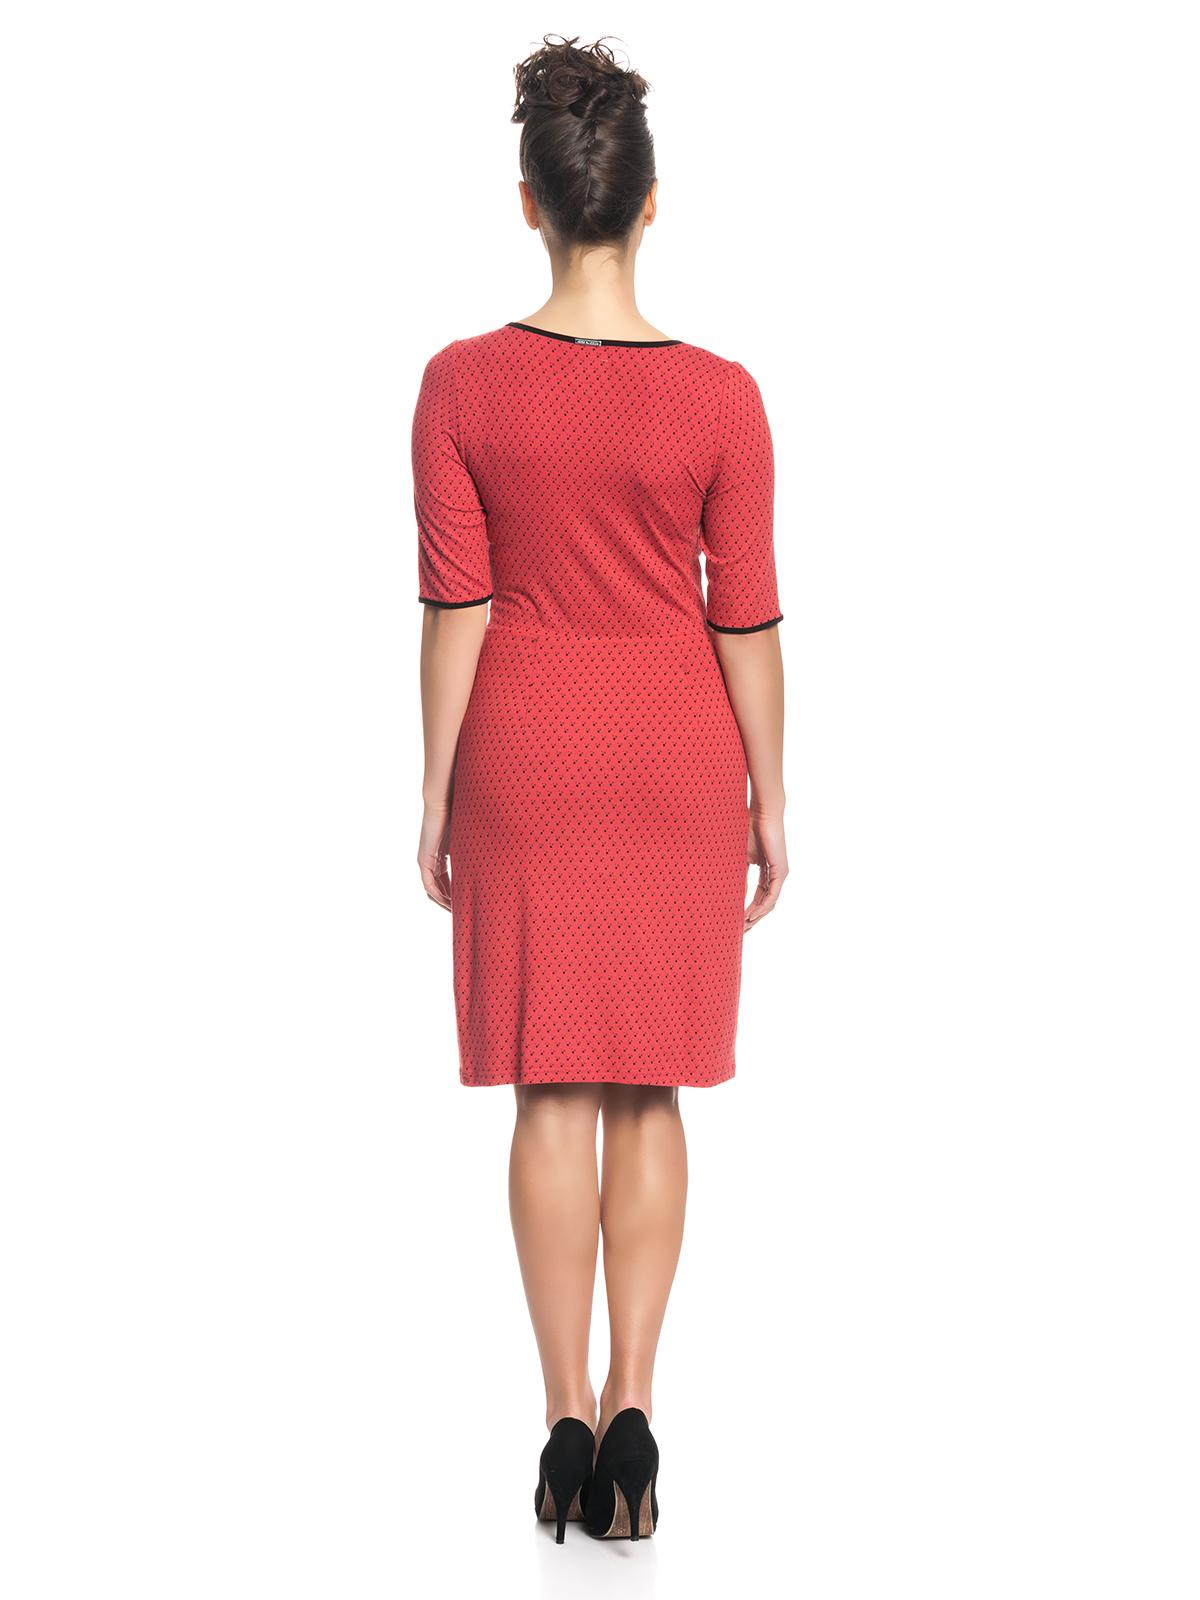 best service 7afed 07804 Vive Maria Lili Damen Kleid Rot Allover